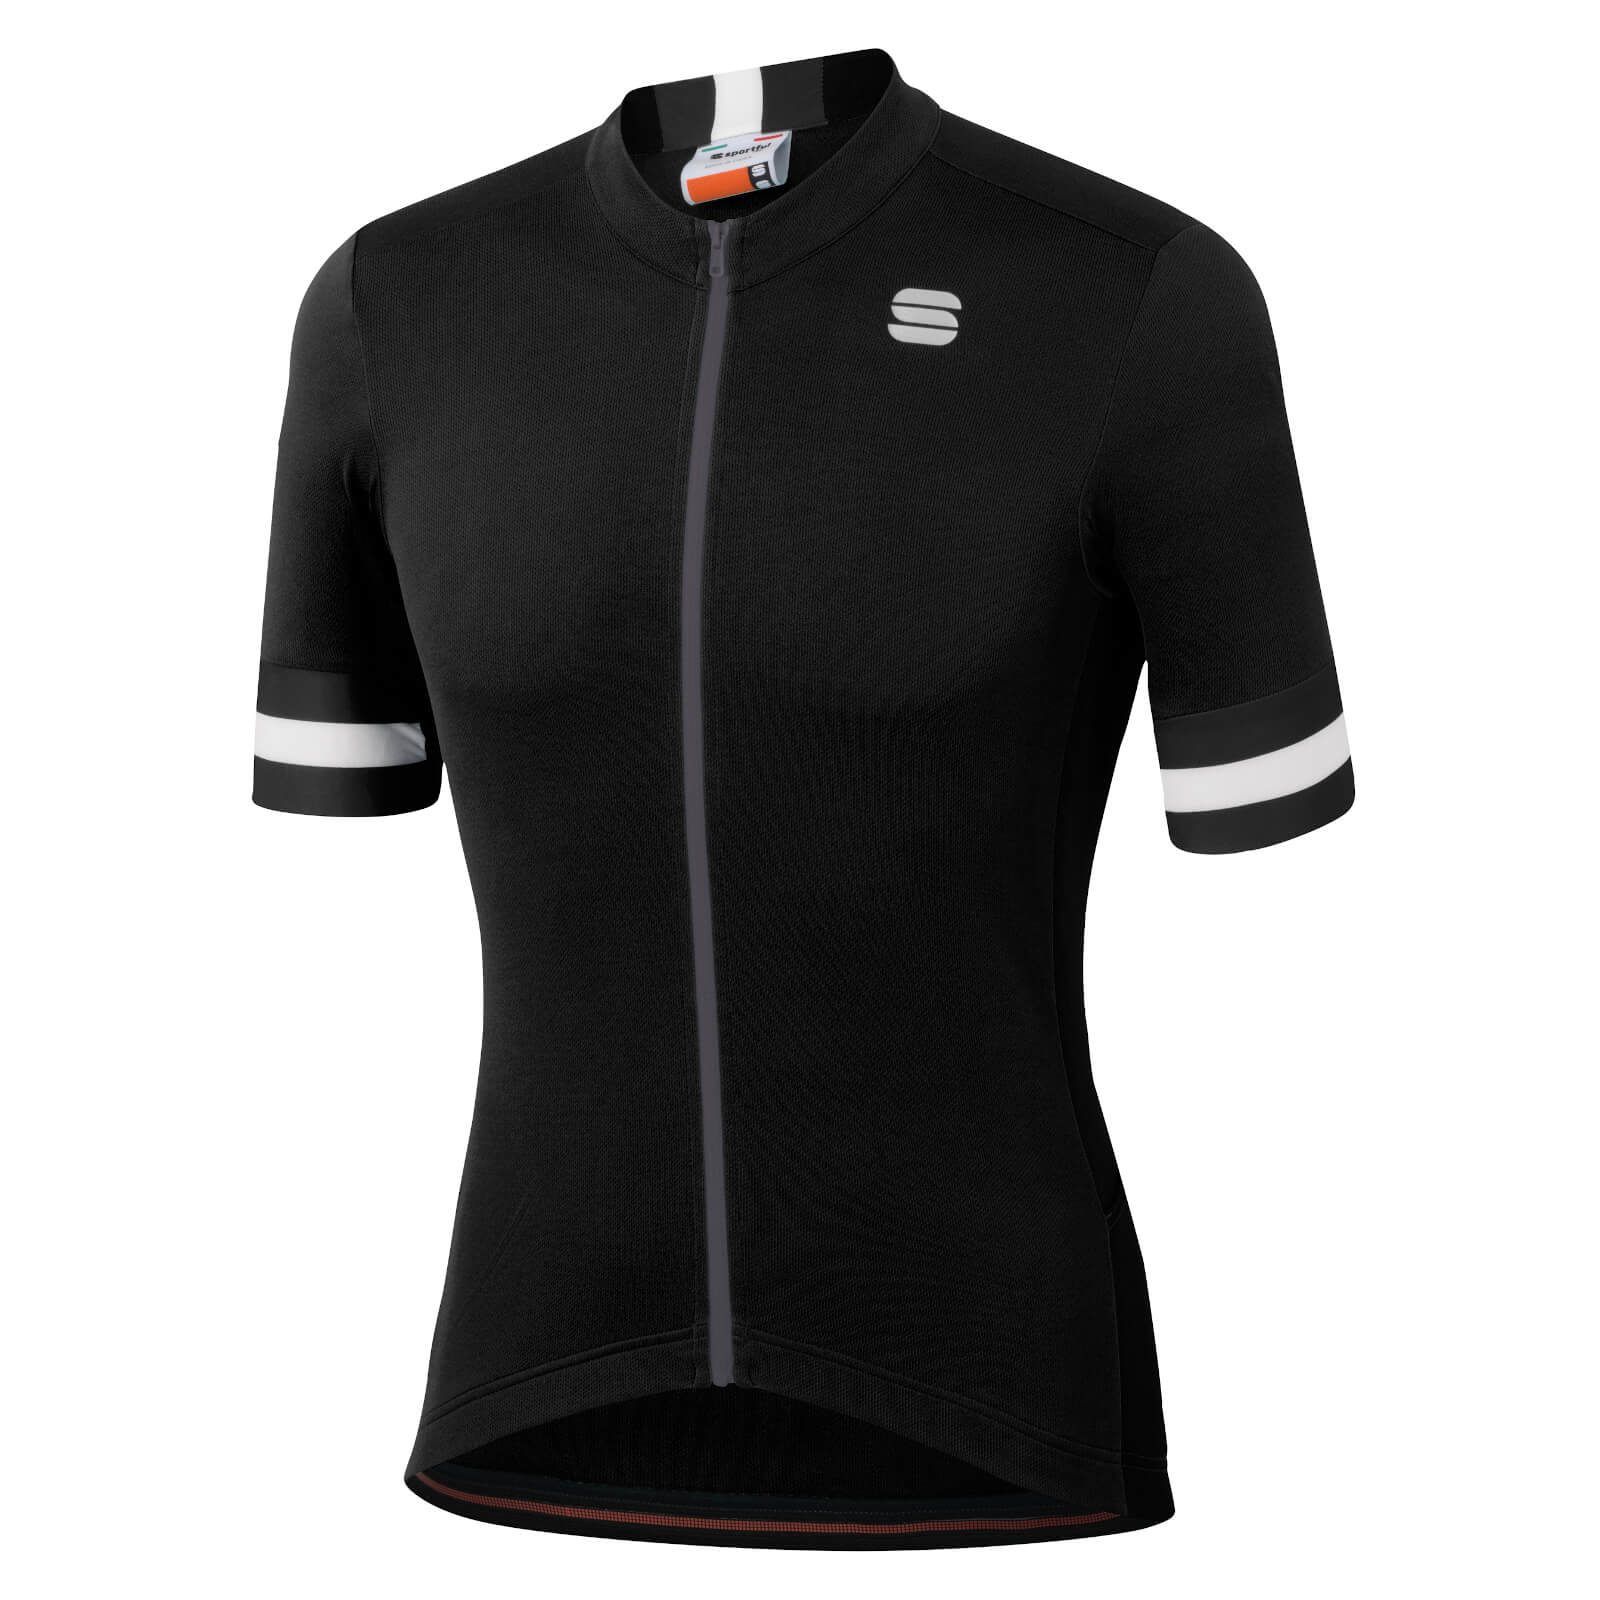 Sportful Kite Jersey - XL - Black